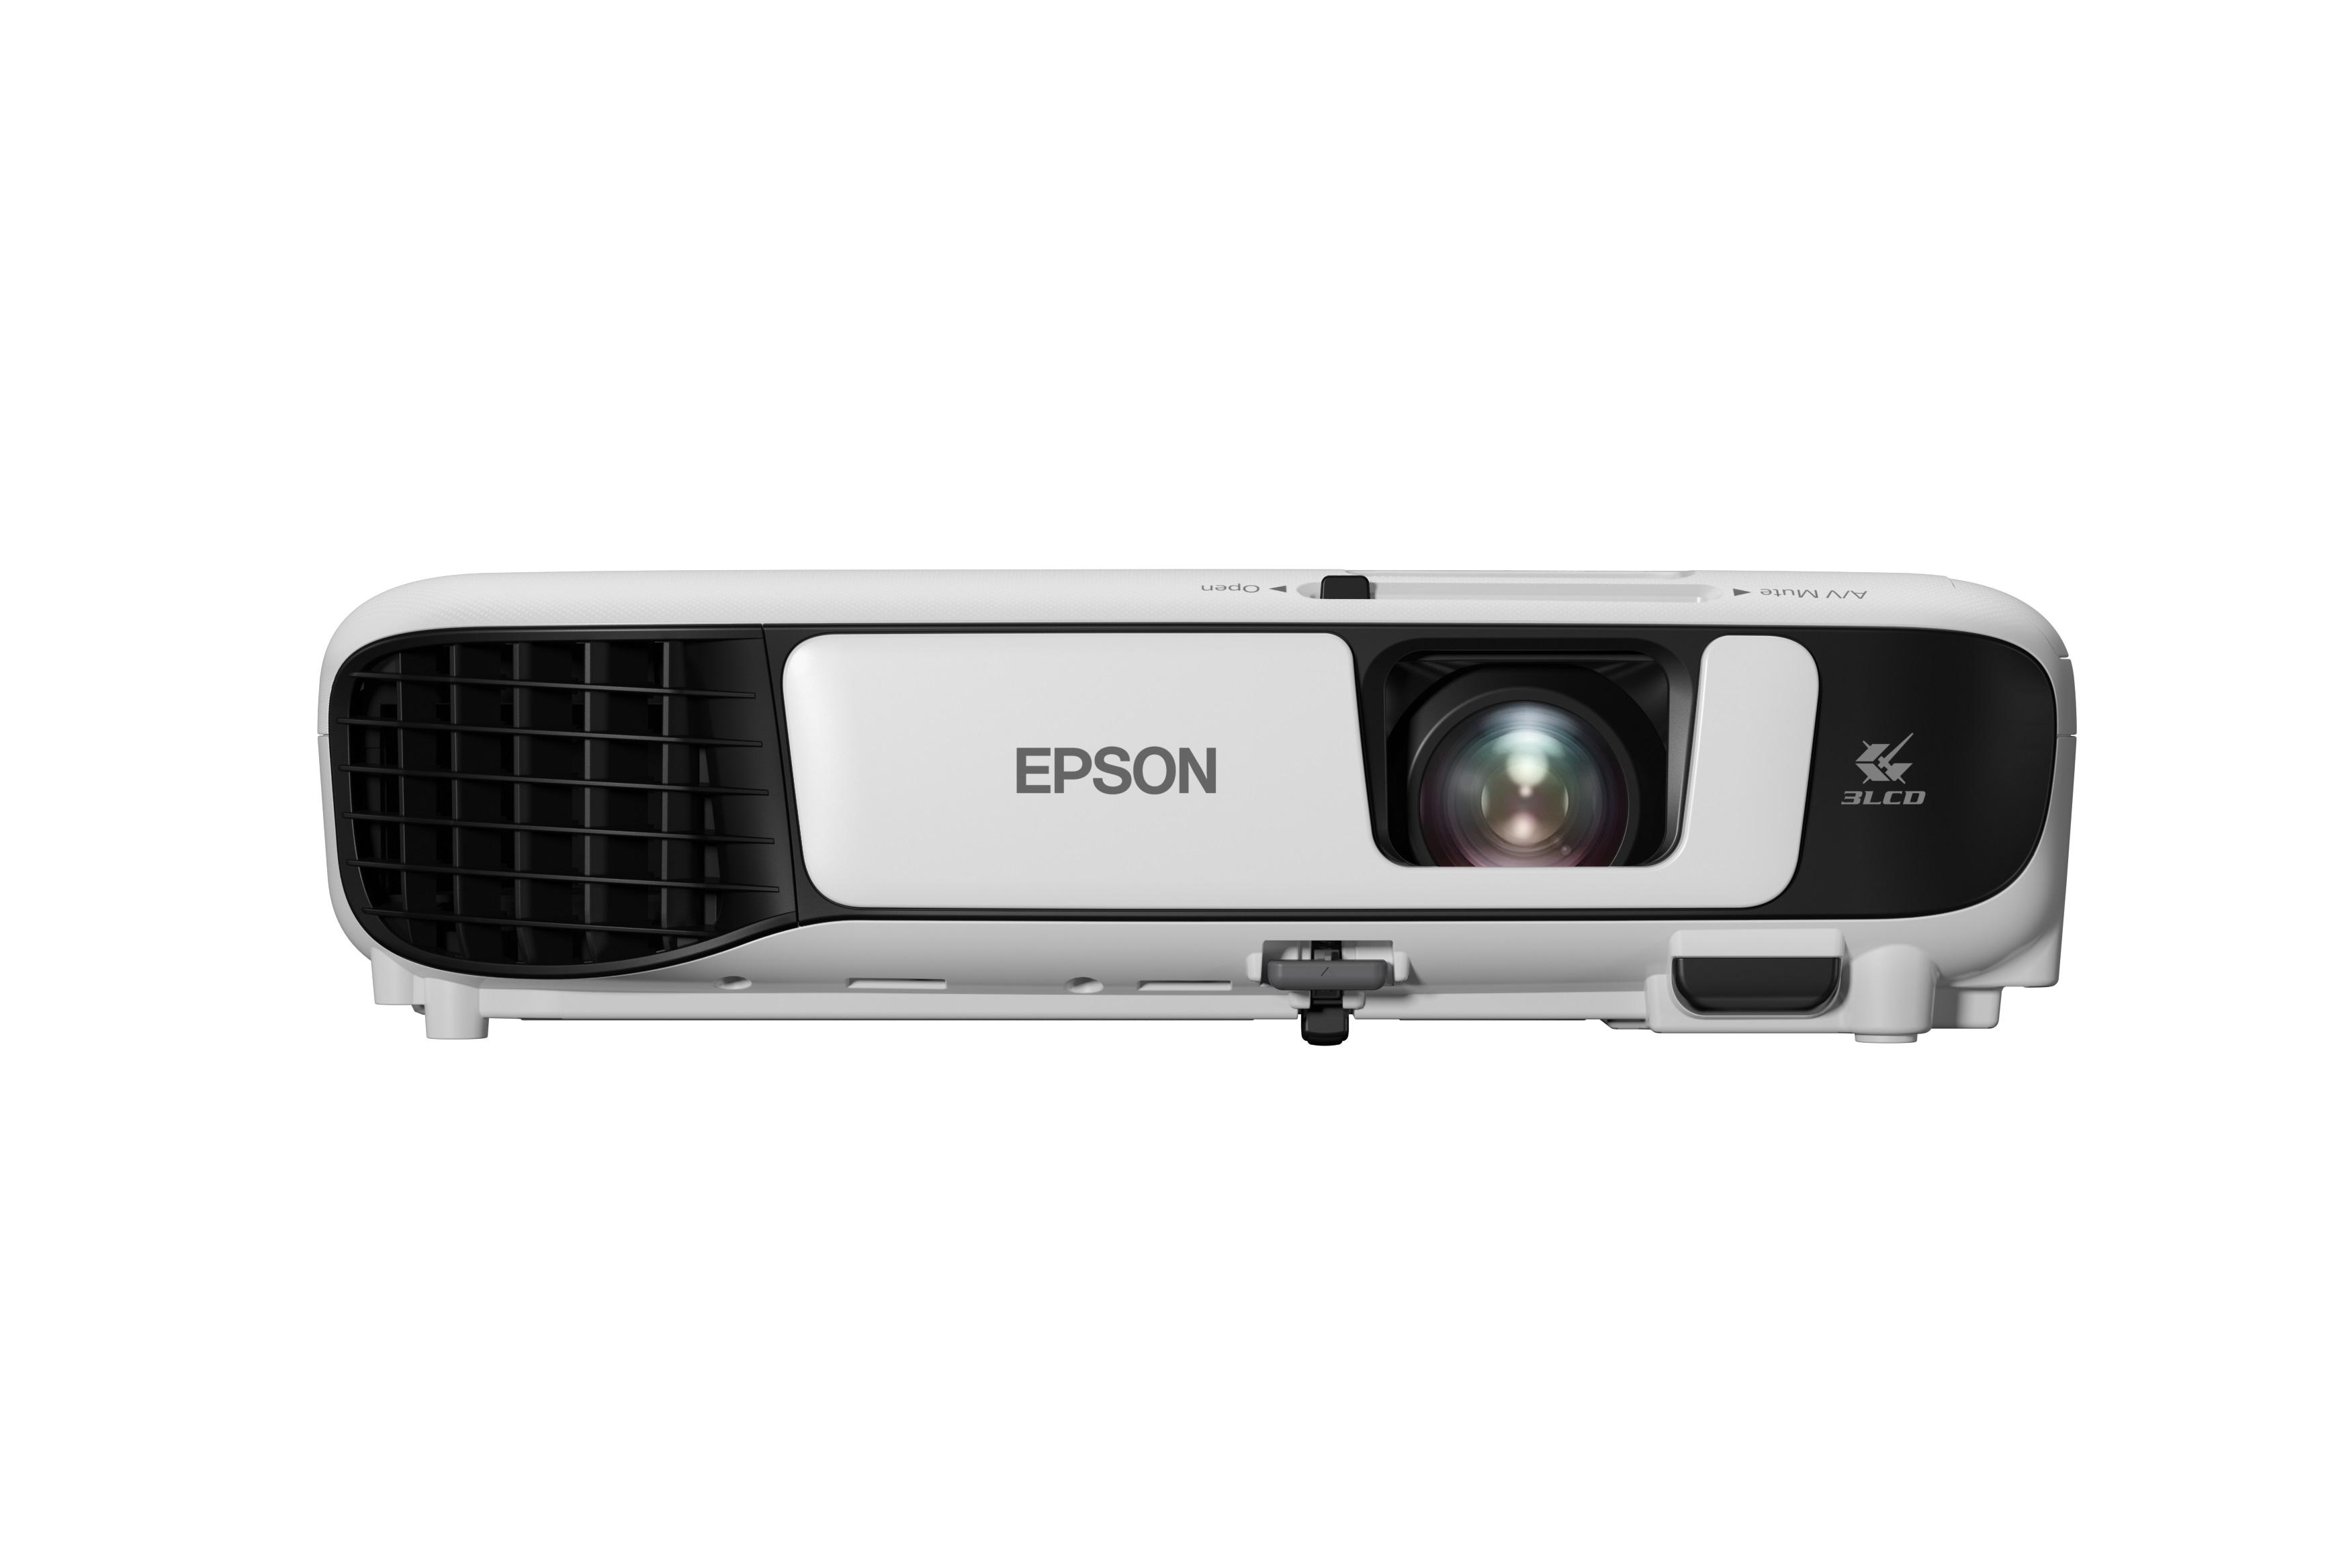 EPSON 3LCD/3chip projektor EB-S41 800x600 SVGA/3300 ANSI/15000:1/HDMI/2W Repro/optionWiFi/